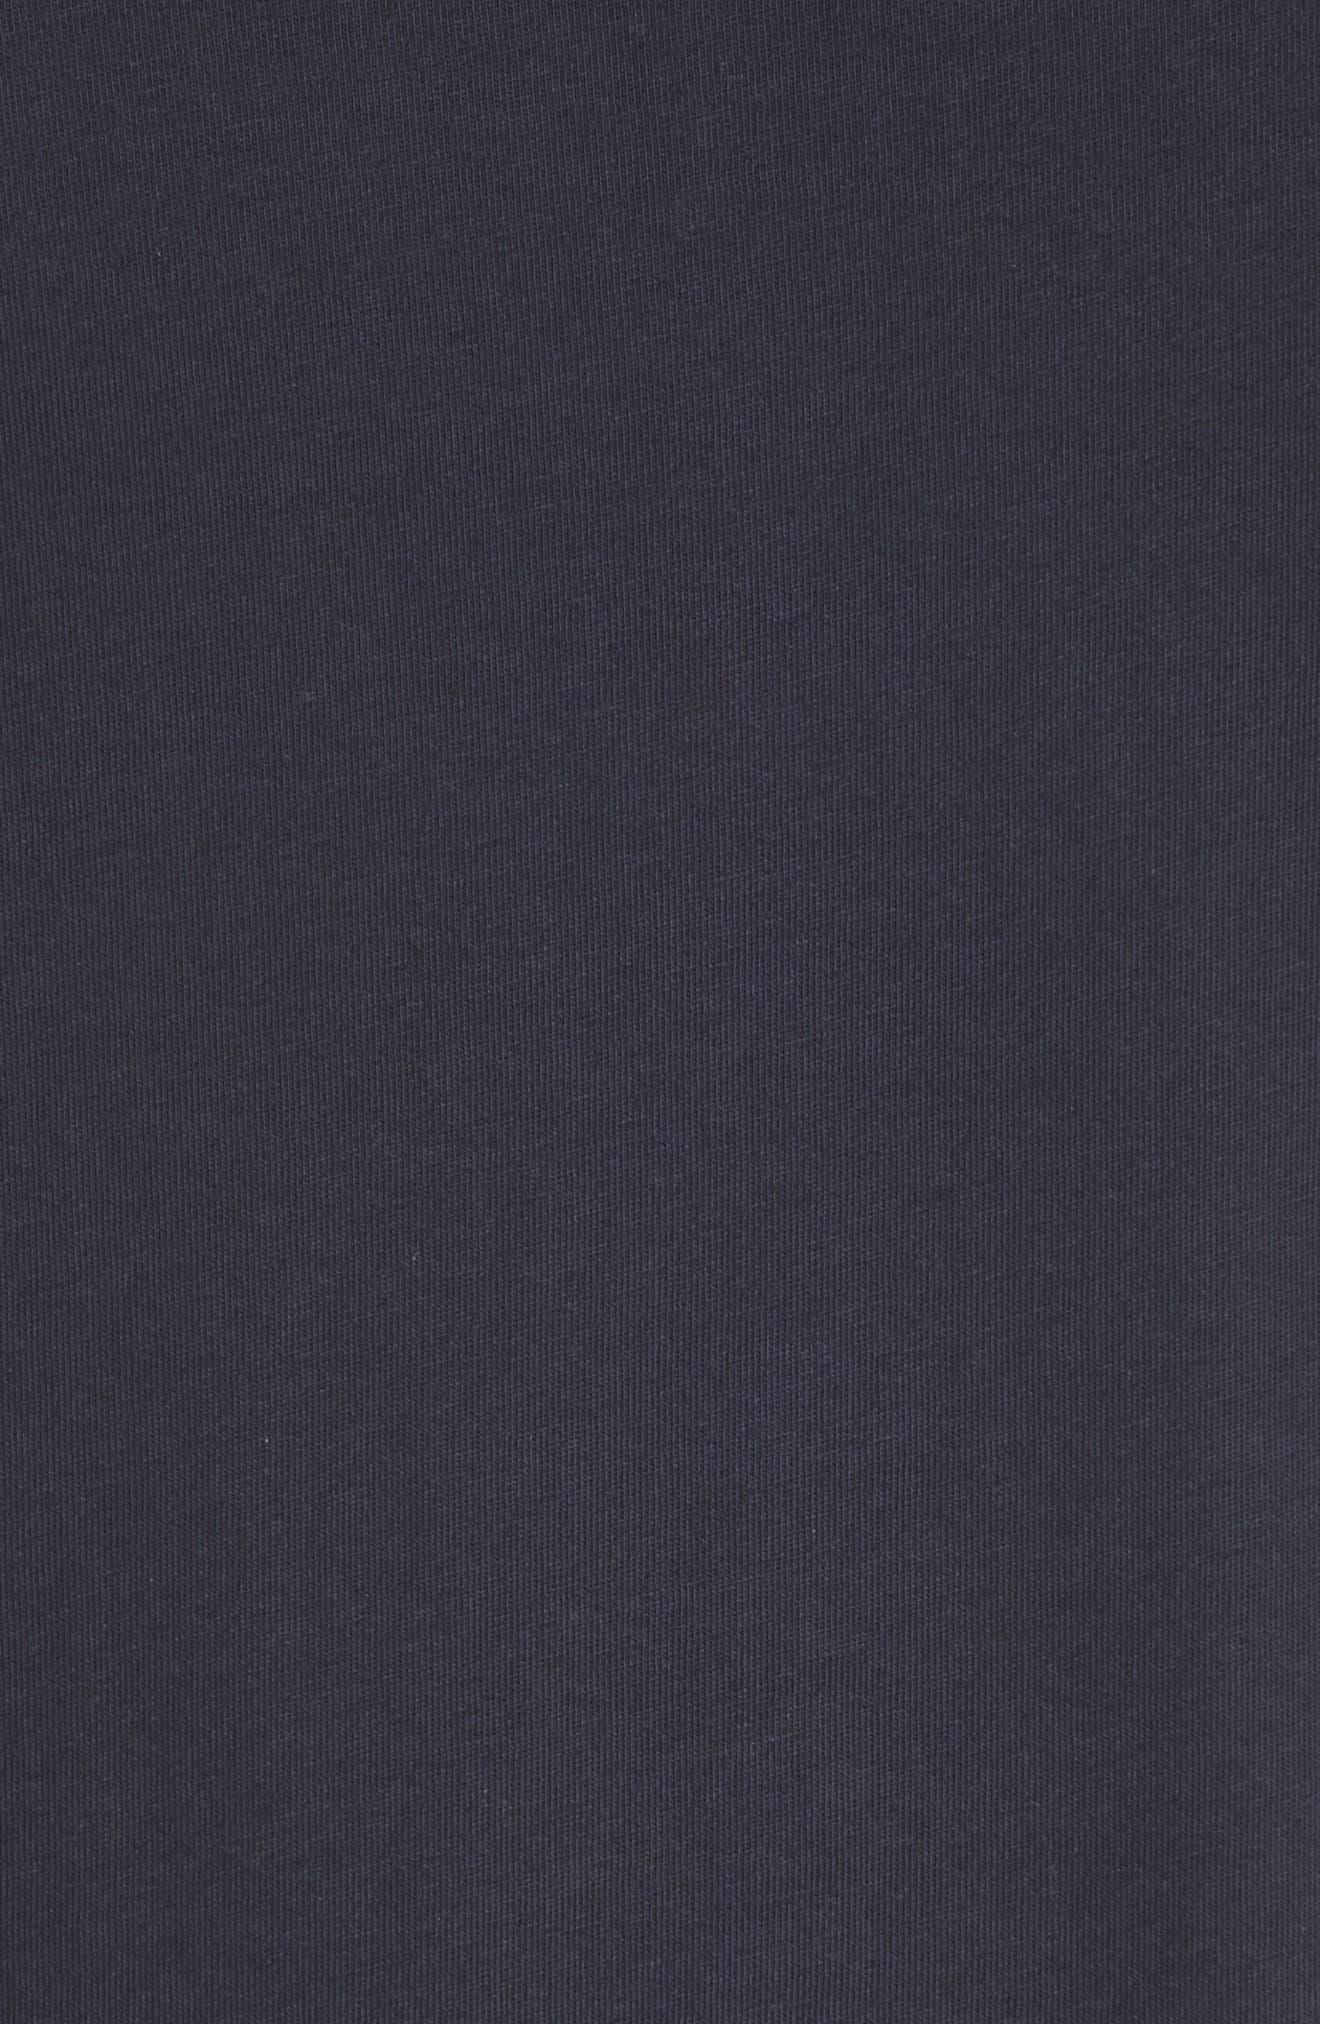 Uima Ruffle Cotton Top,                             Alternate thumbnail 10, color,